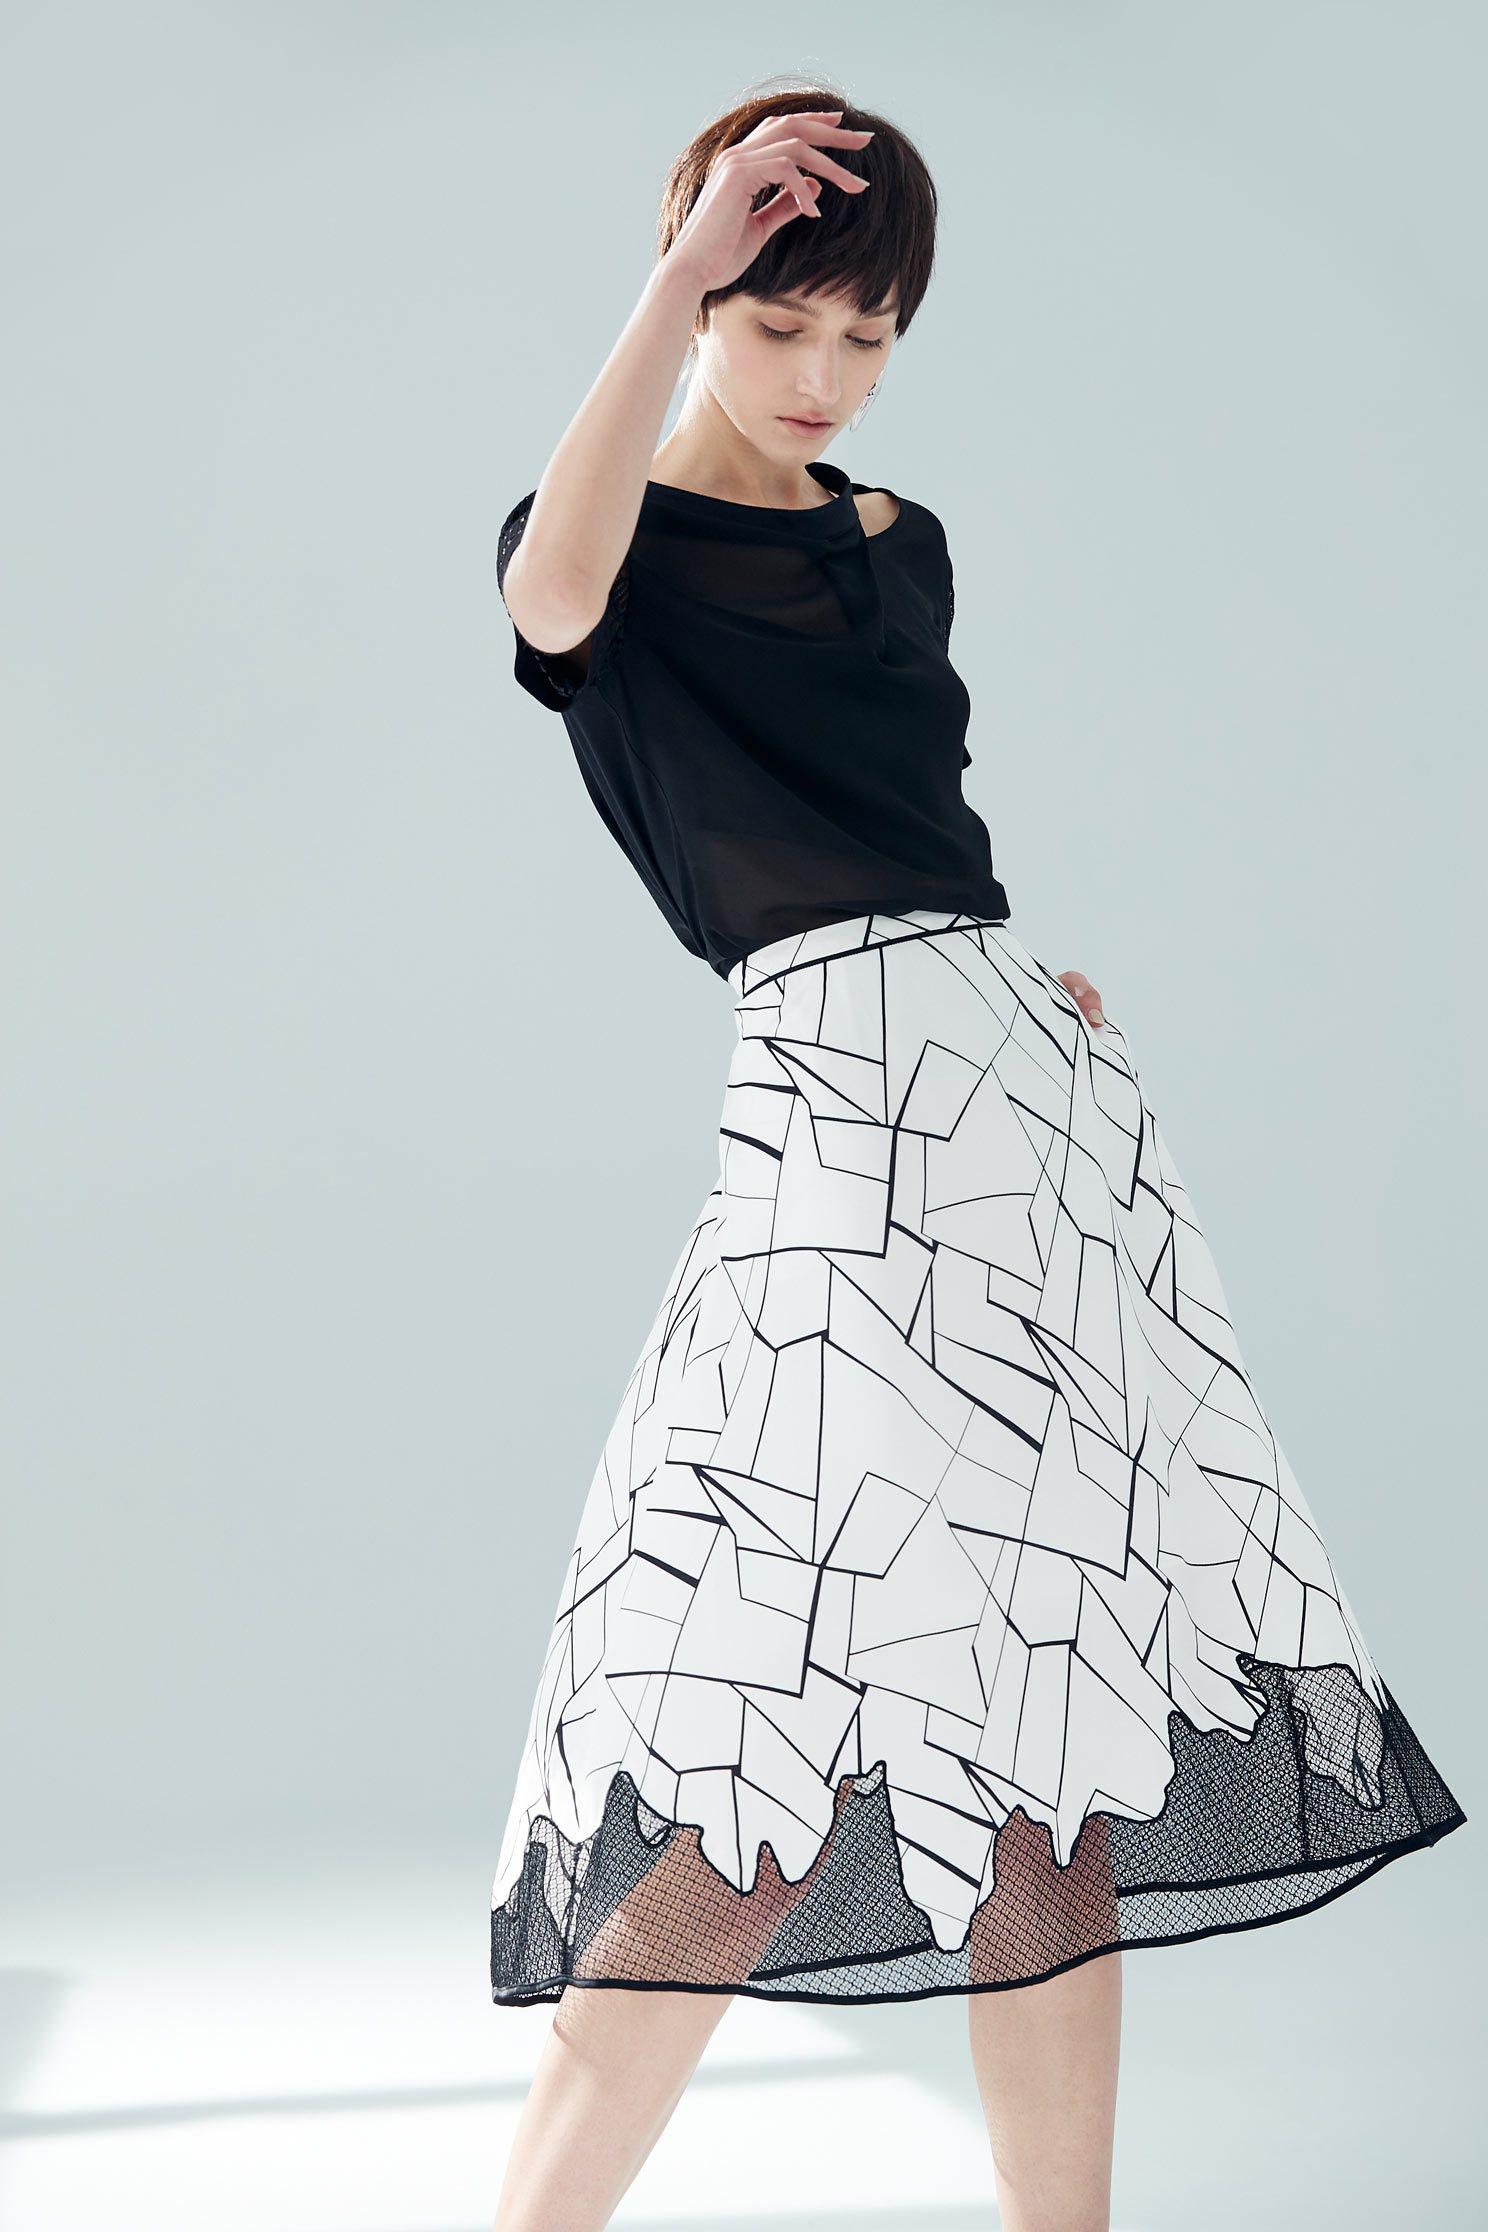 Micro-transparent stitching classic design long skirt,pleatedskirt,longskirt